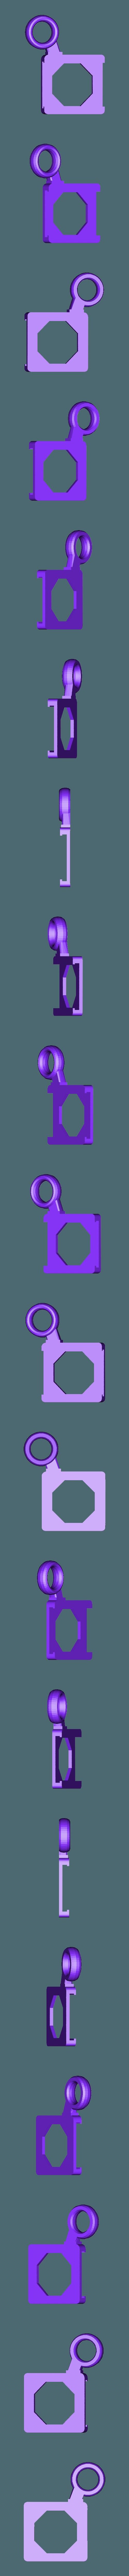 Anycubic_Mega-S_hotbed_handle.stl Download free STL file Anycubic I3 Mega Raspberry Pi Camera Mount - Remix • Design to 3D print, nik101968